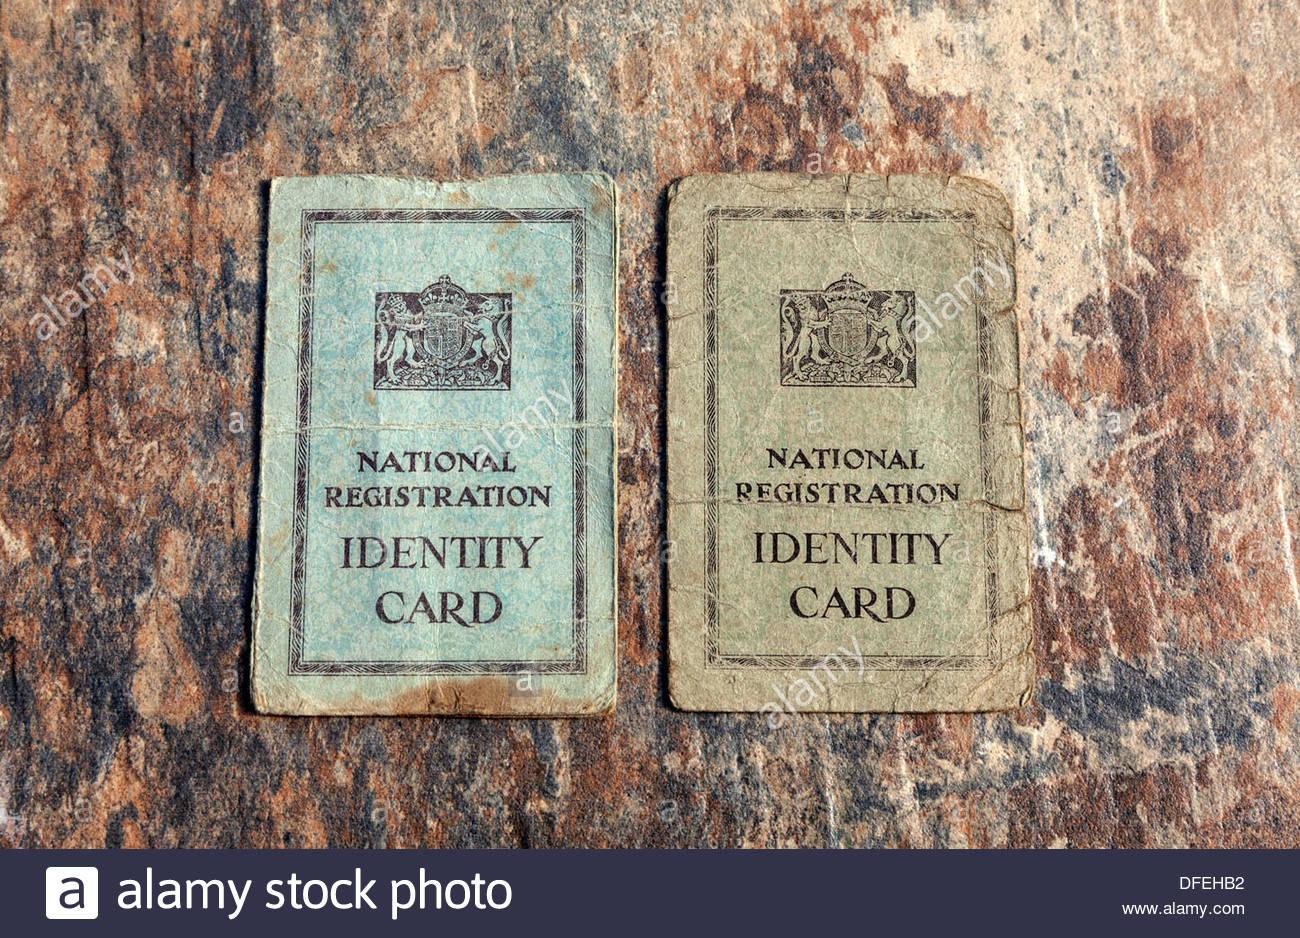 National Registration Identity Cards - Stock Image